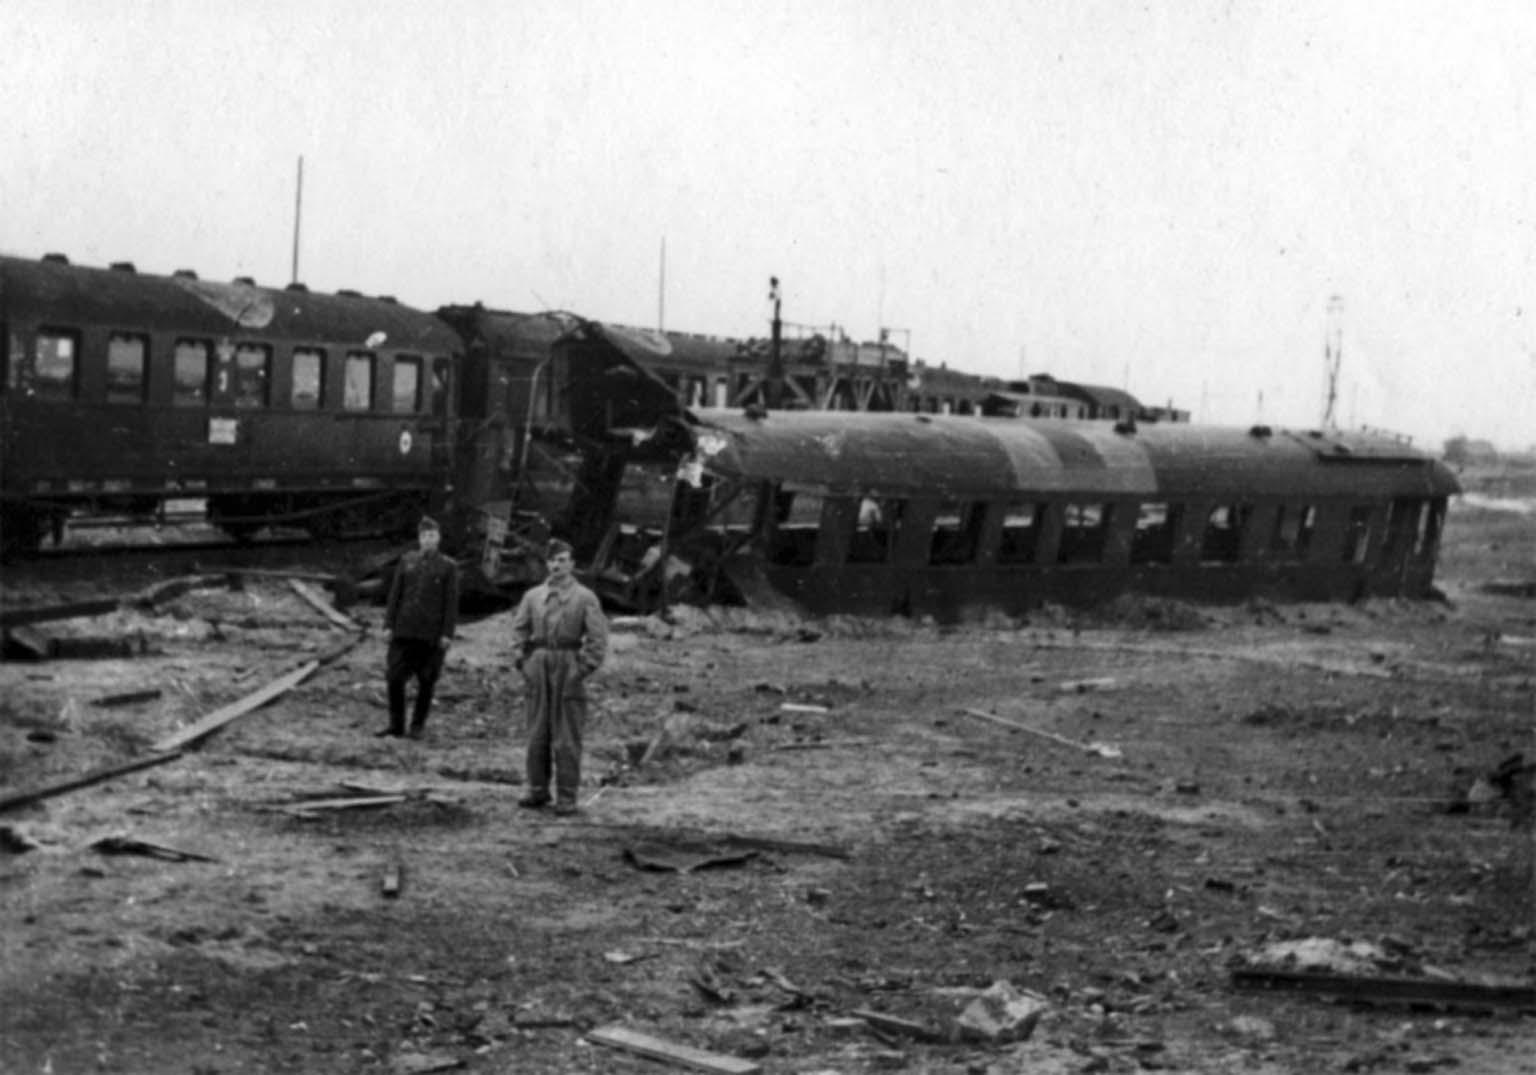 military-sanitary train